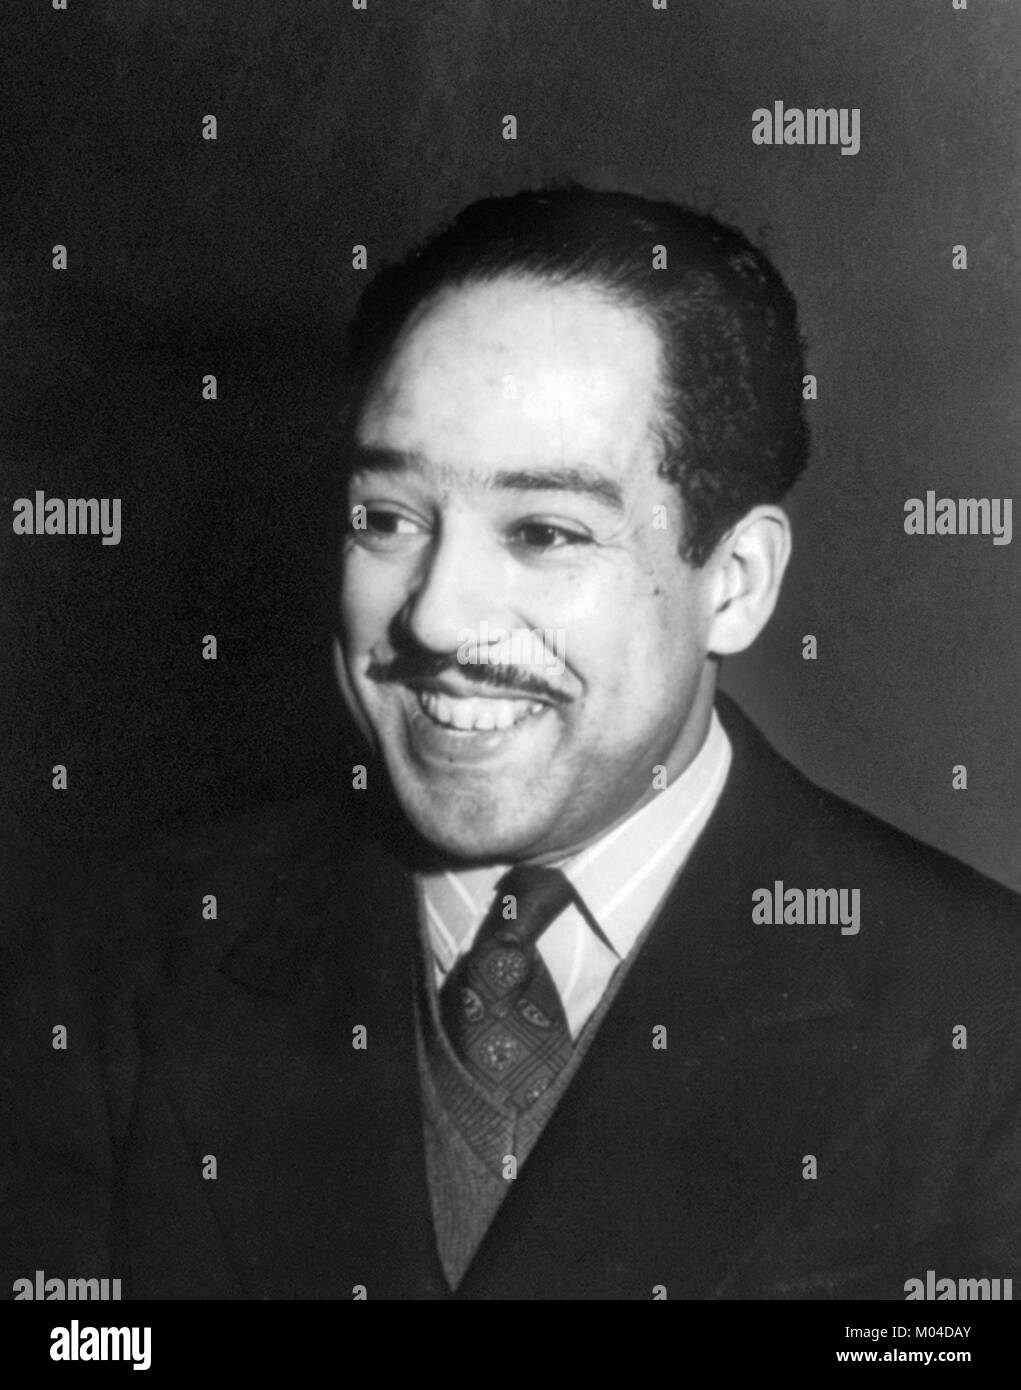 Langston Hughes. Portrait of the American poet, playwright and acivist James Mercer Langston Hughes (1902-1967) - Stock Image